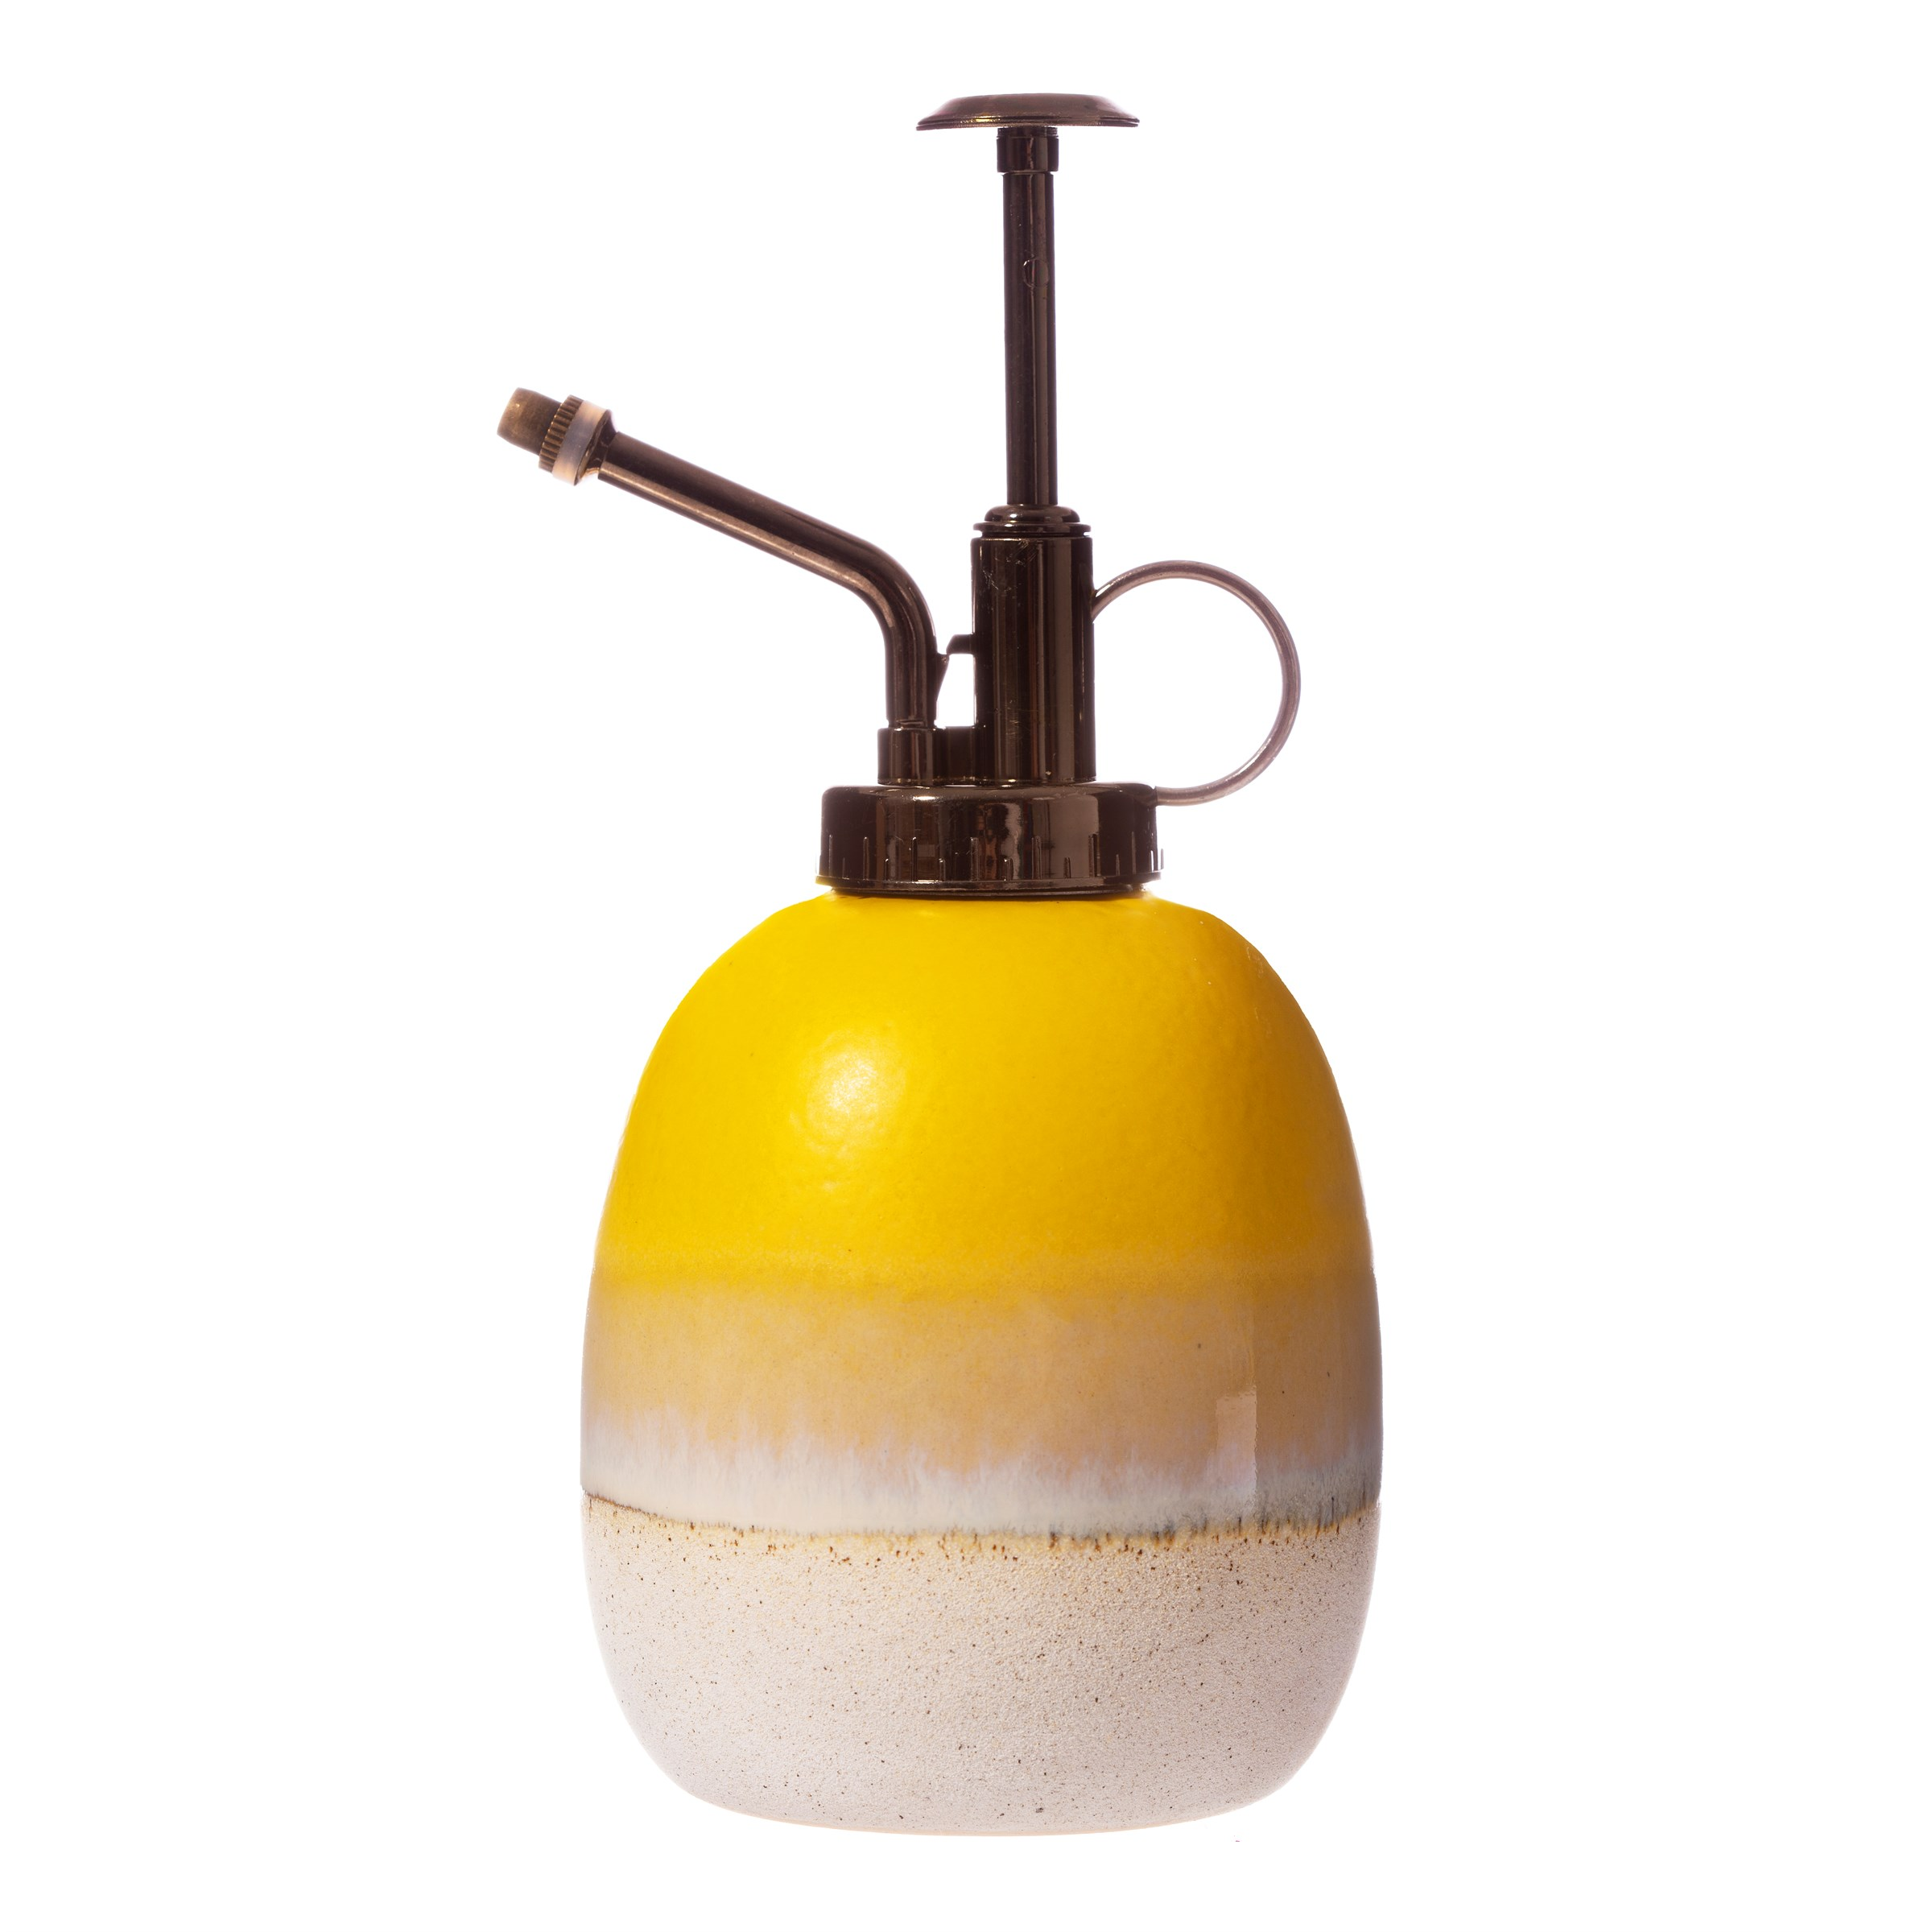 Mojave Glaze Yellow Ceramic Plant Mister